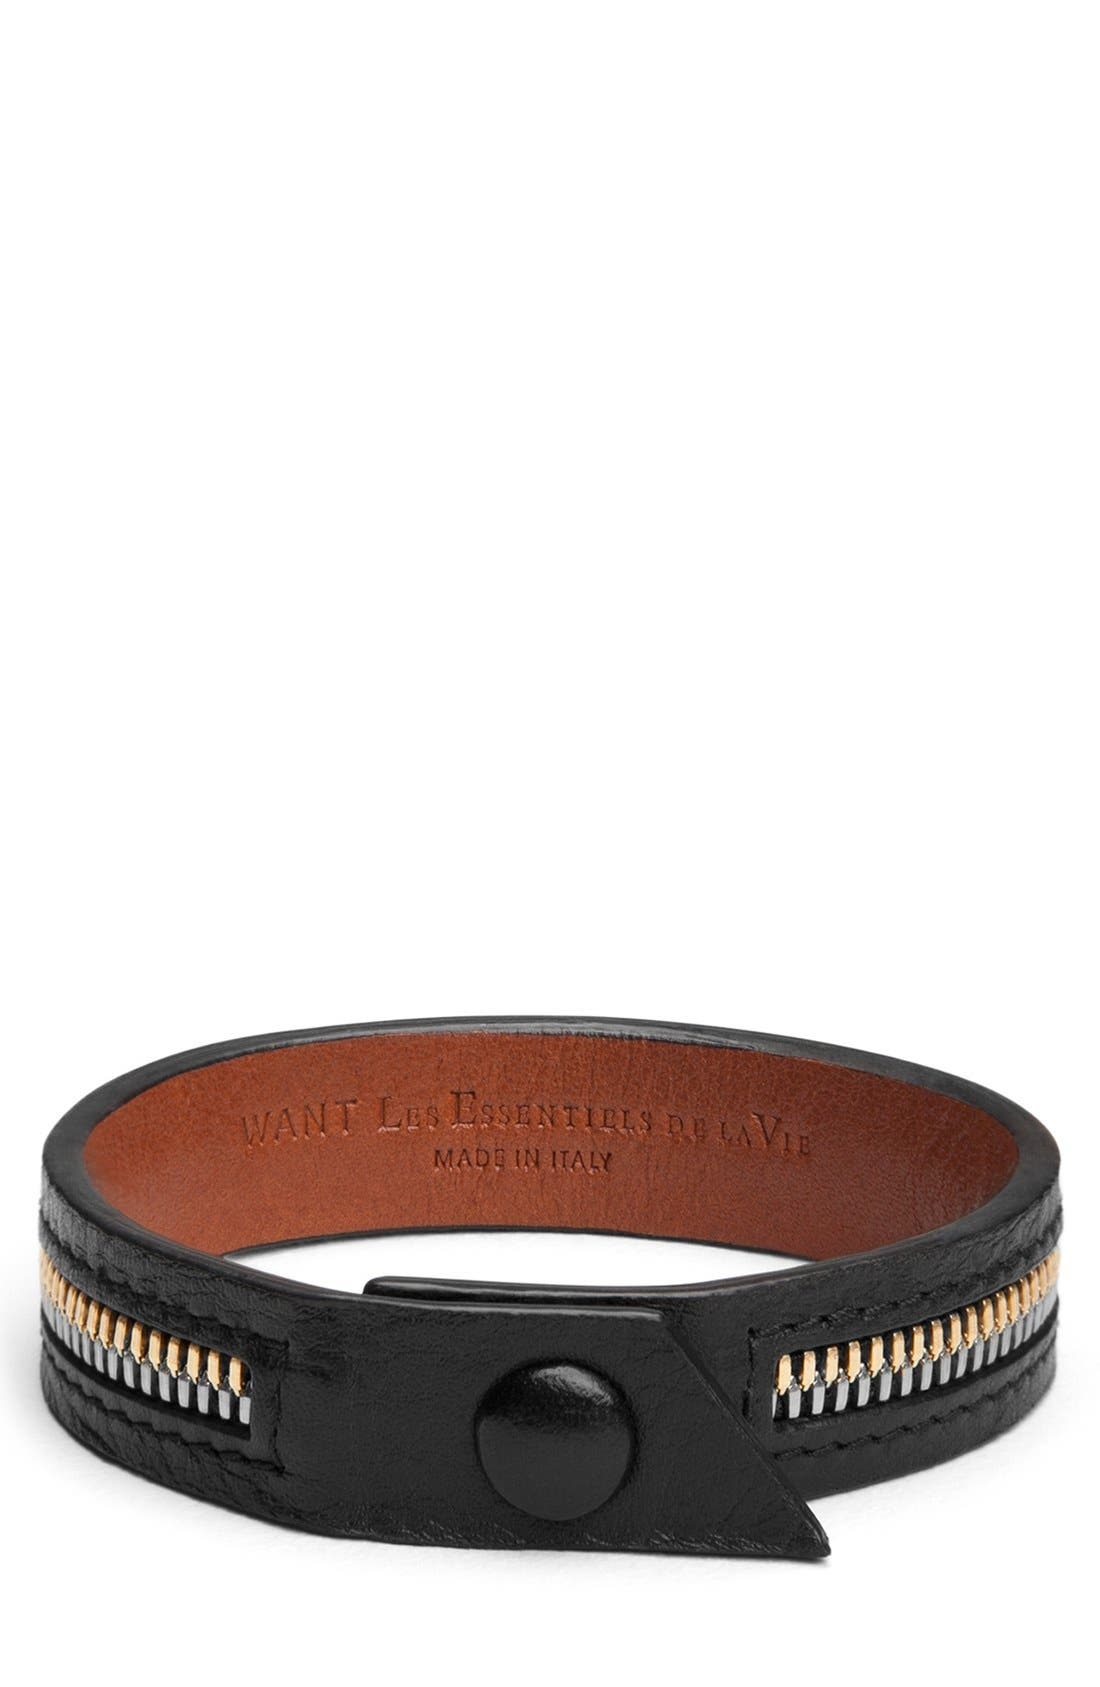 Tambo Zip Bracelet,                         Main,                         color, 010